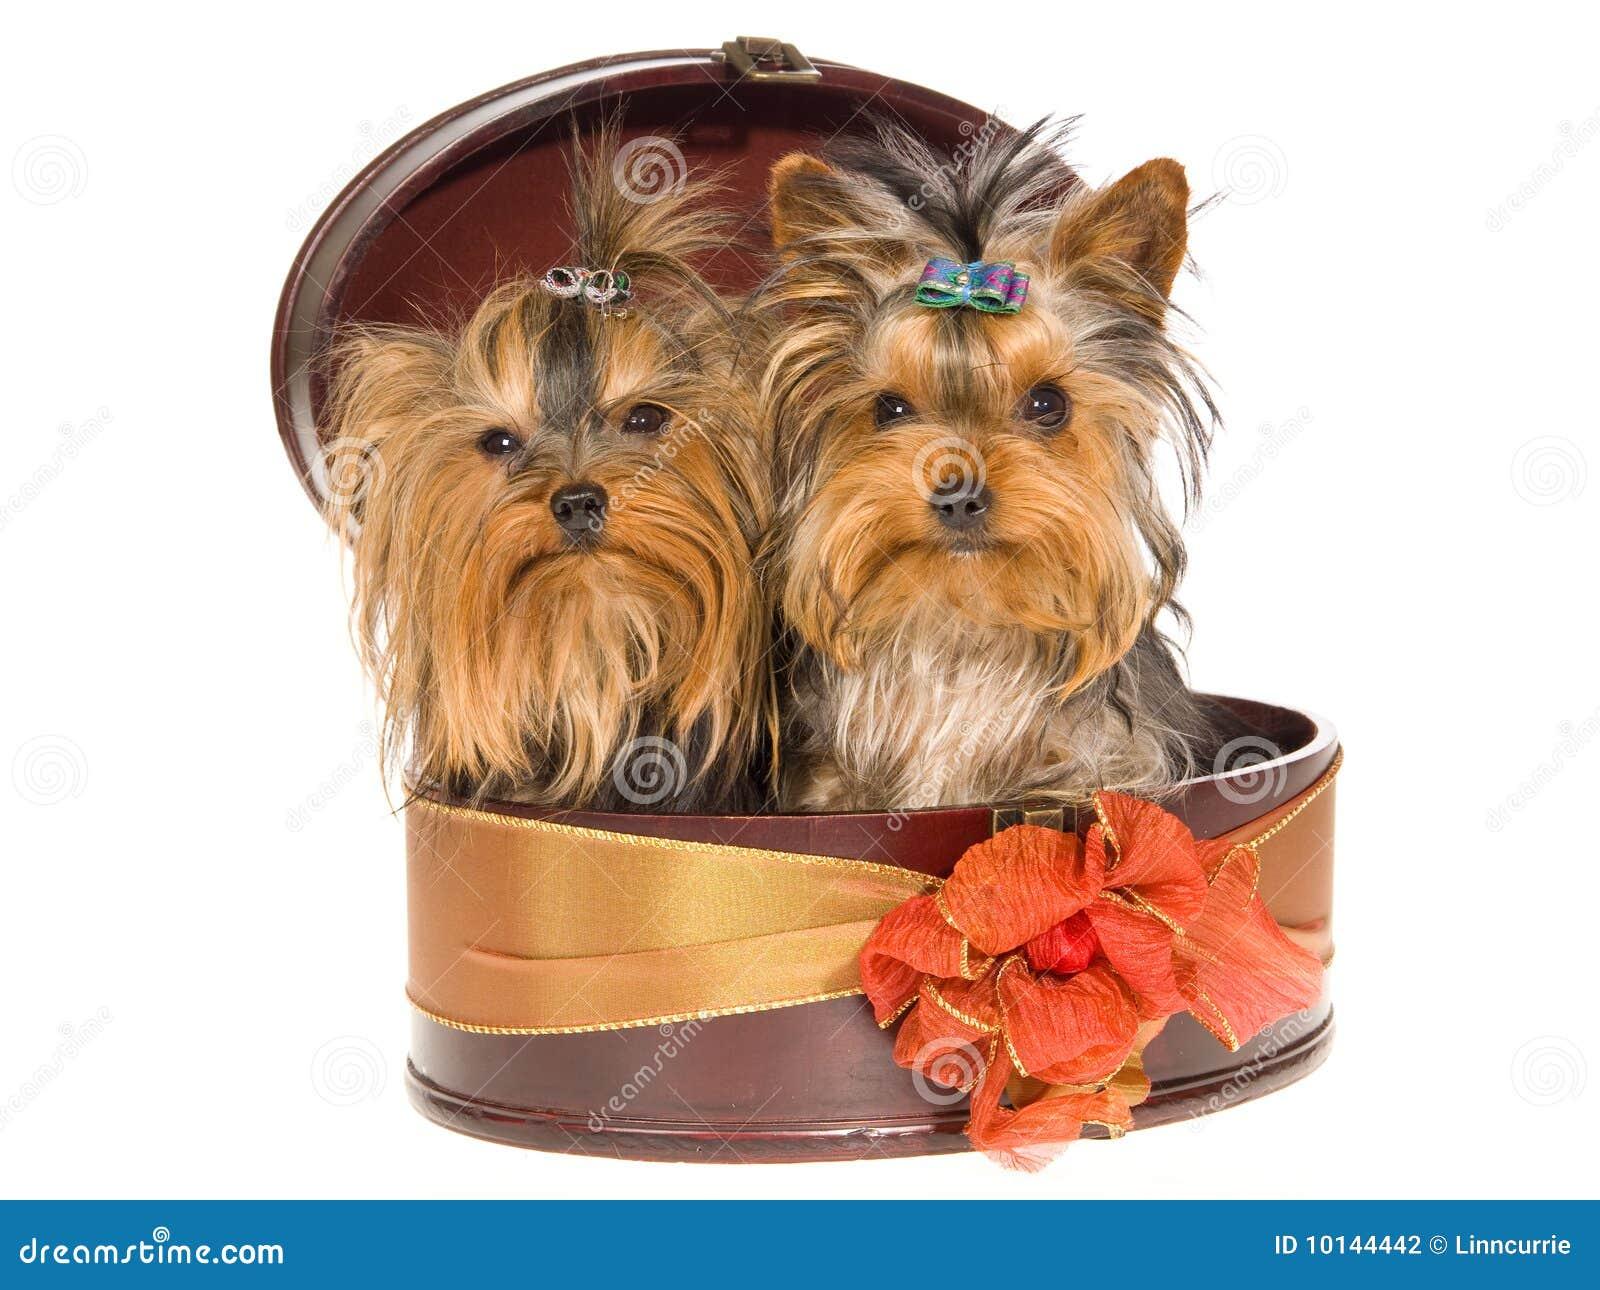 2 Cute Yorkie Pups Sitting Inside Round Gift Box Stock